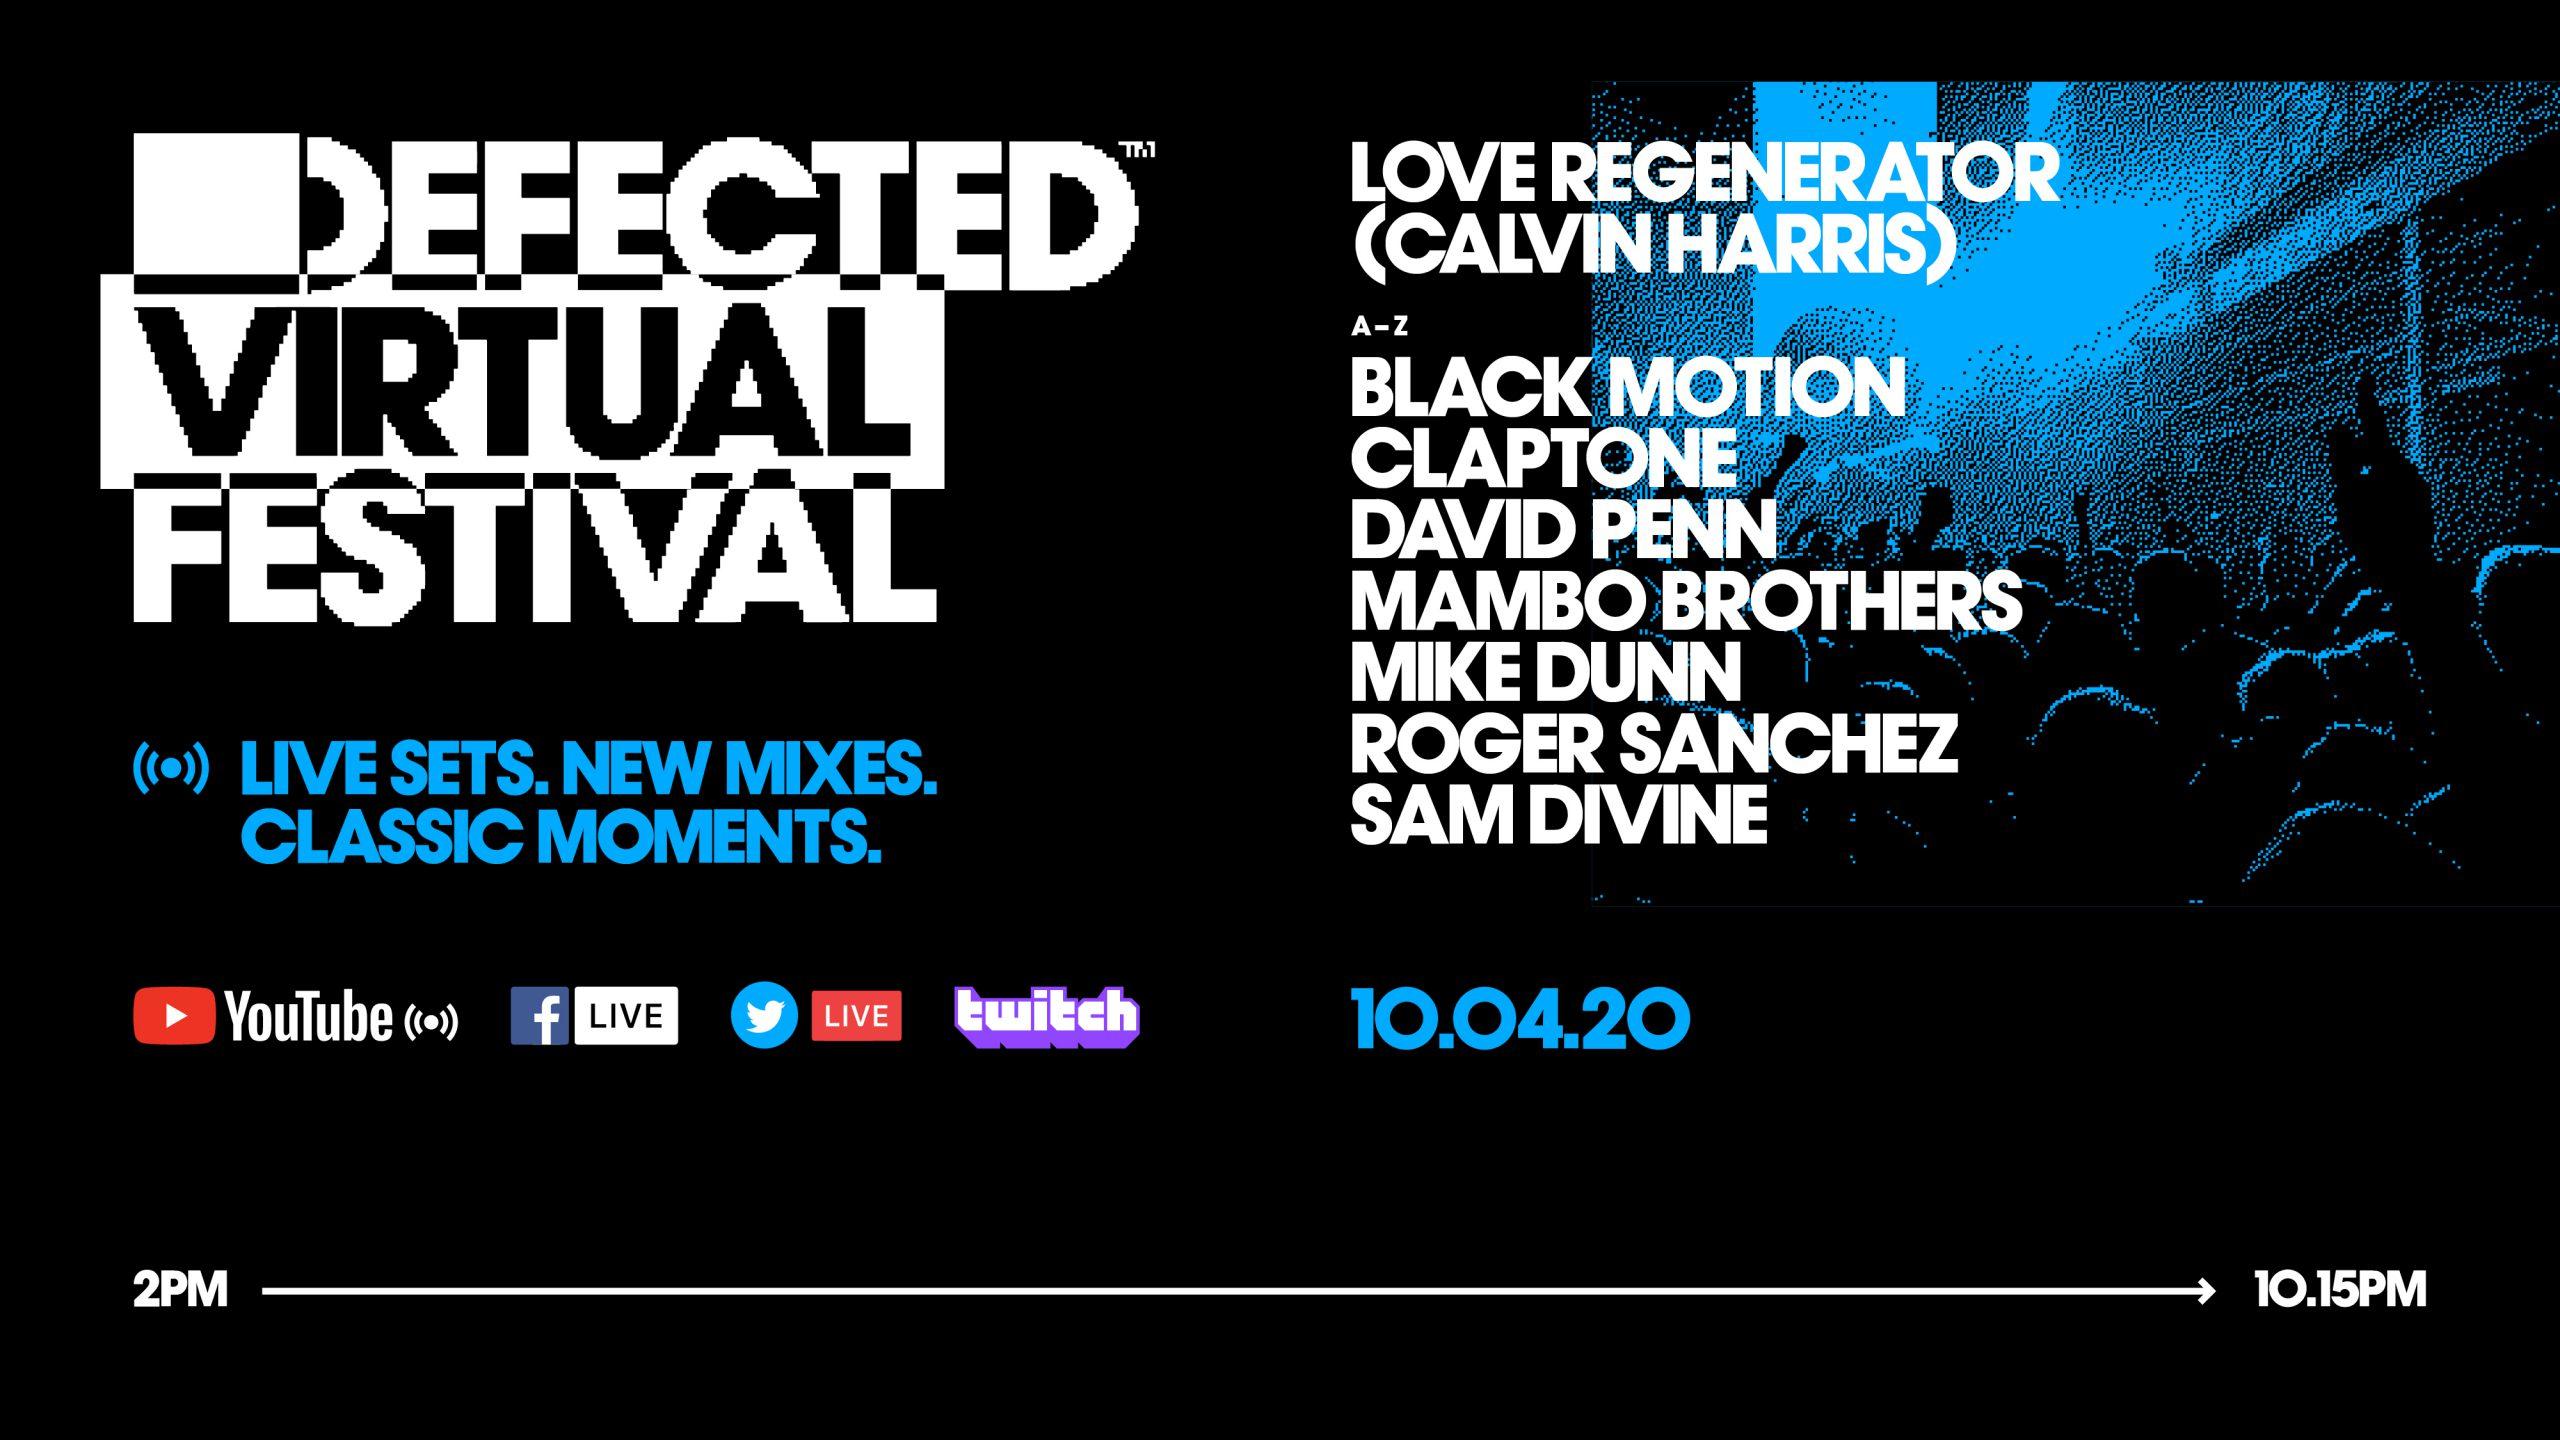 Defected Virtual Festival 3.0 Lineup